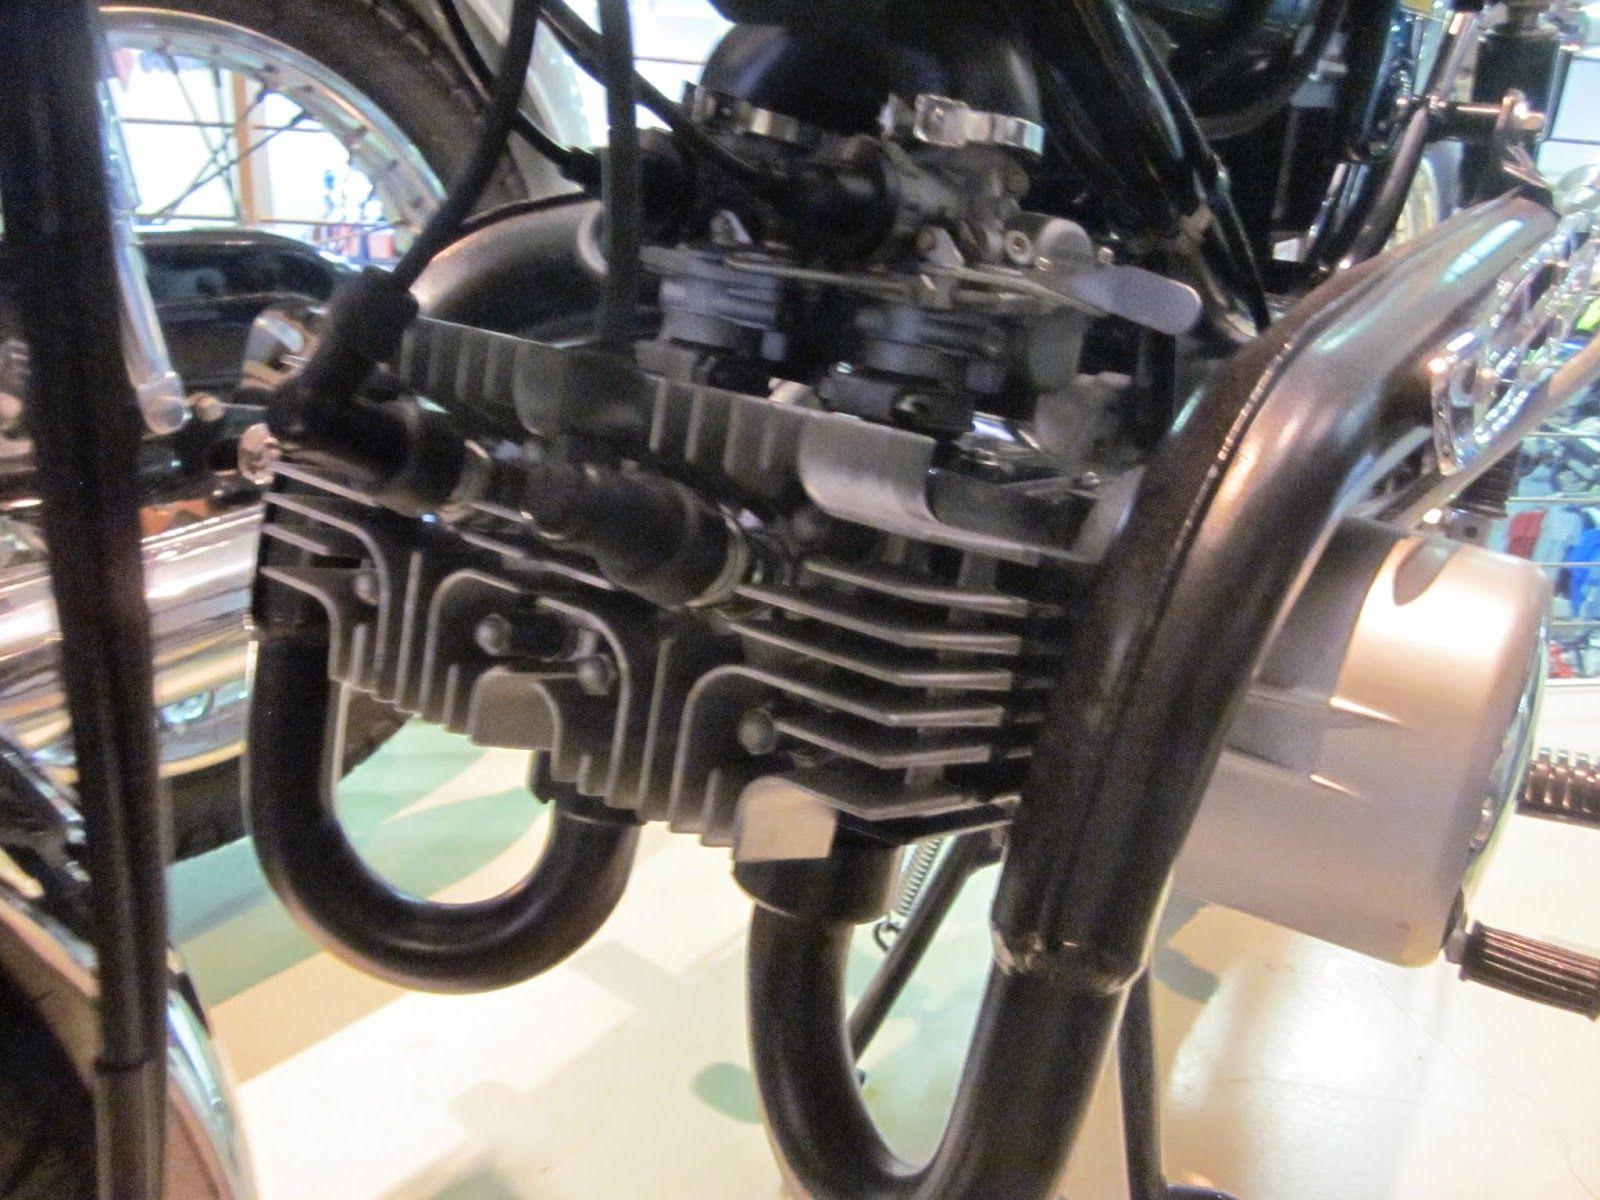 Suzuki 125 twin on display at hinshaw 39 s motorcycle store for Hinshaw honda auburn wa